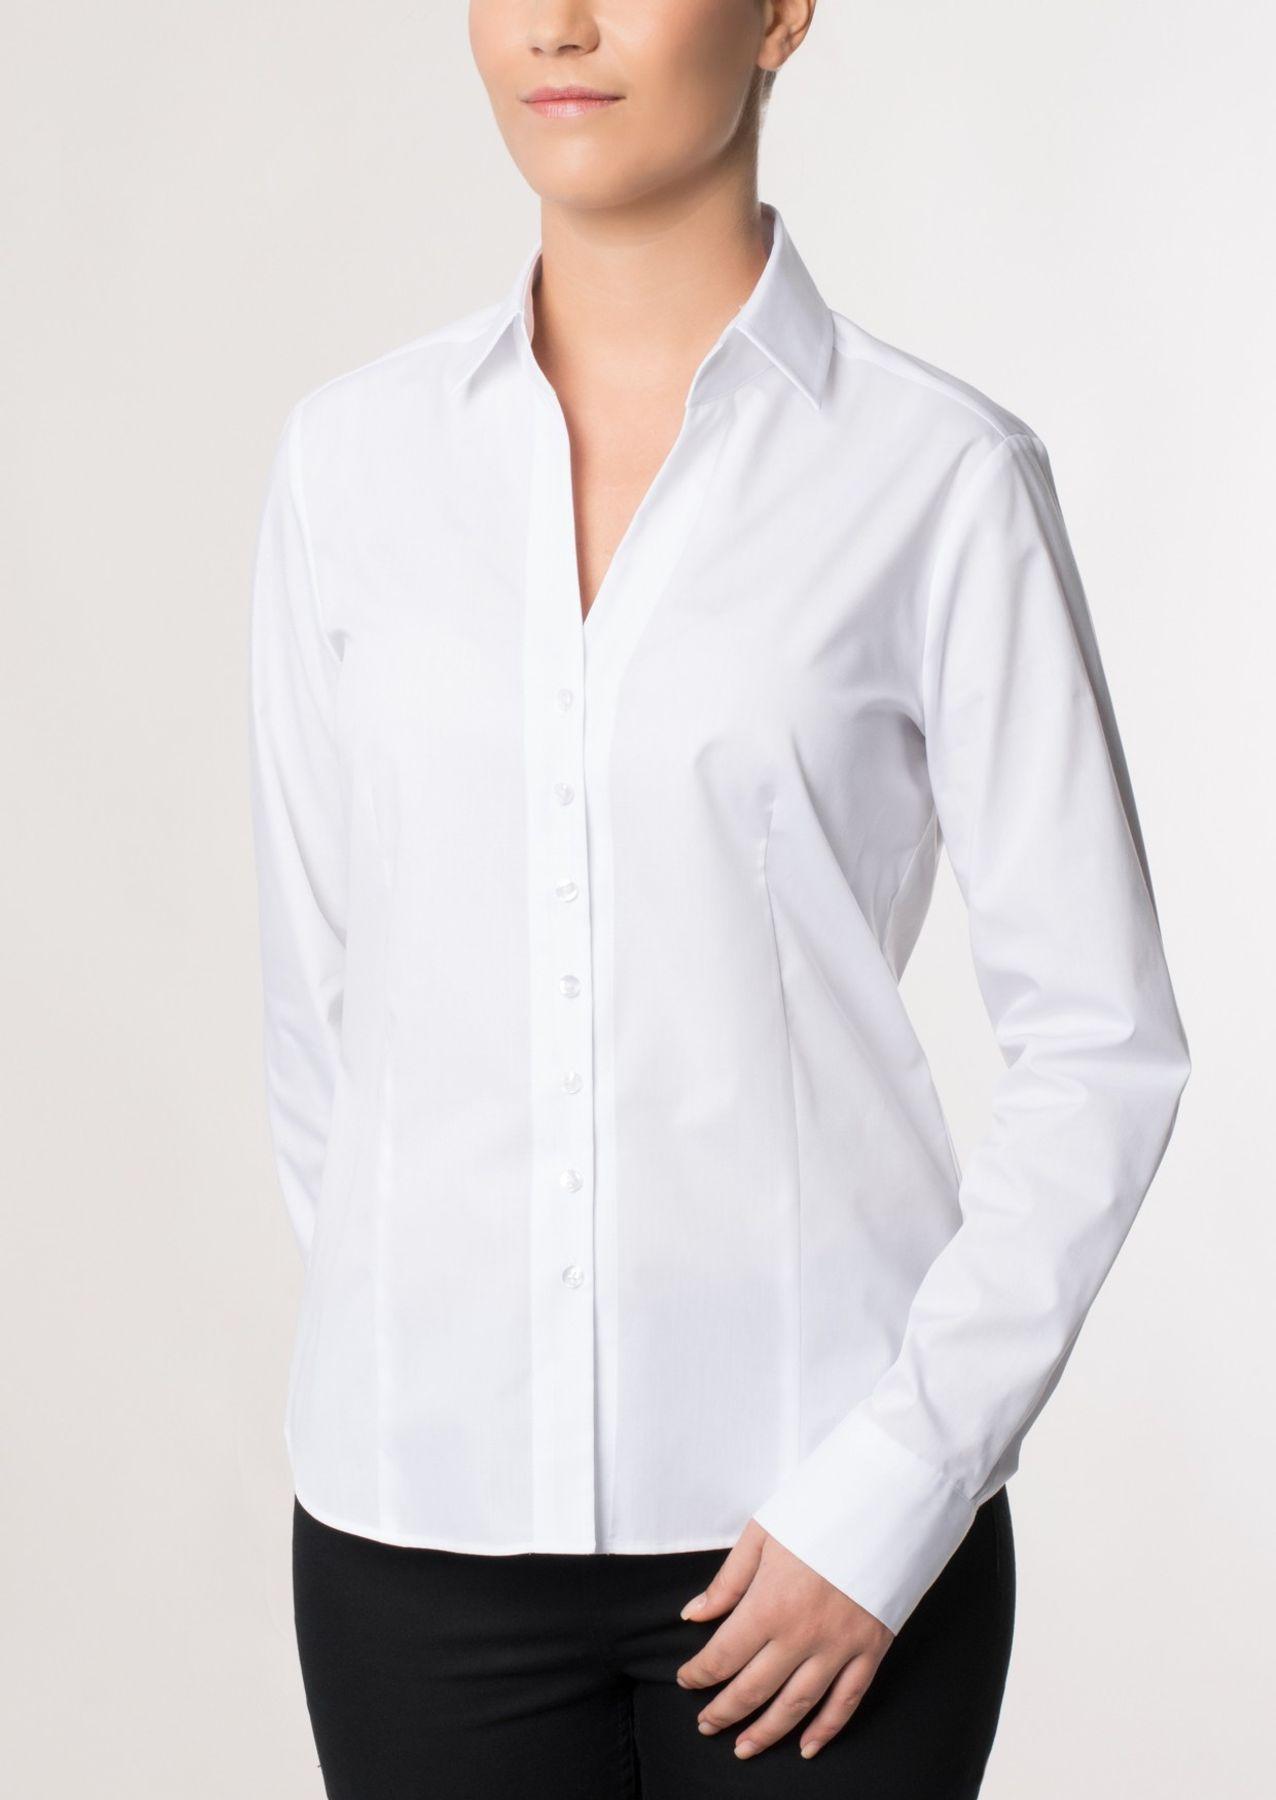 Eterna -  Comfort-Fit - Damen Langarm Bluse in Hellblau kariert  (5330 D661) – Bild 2